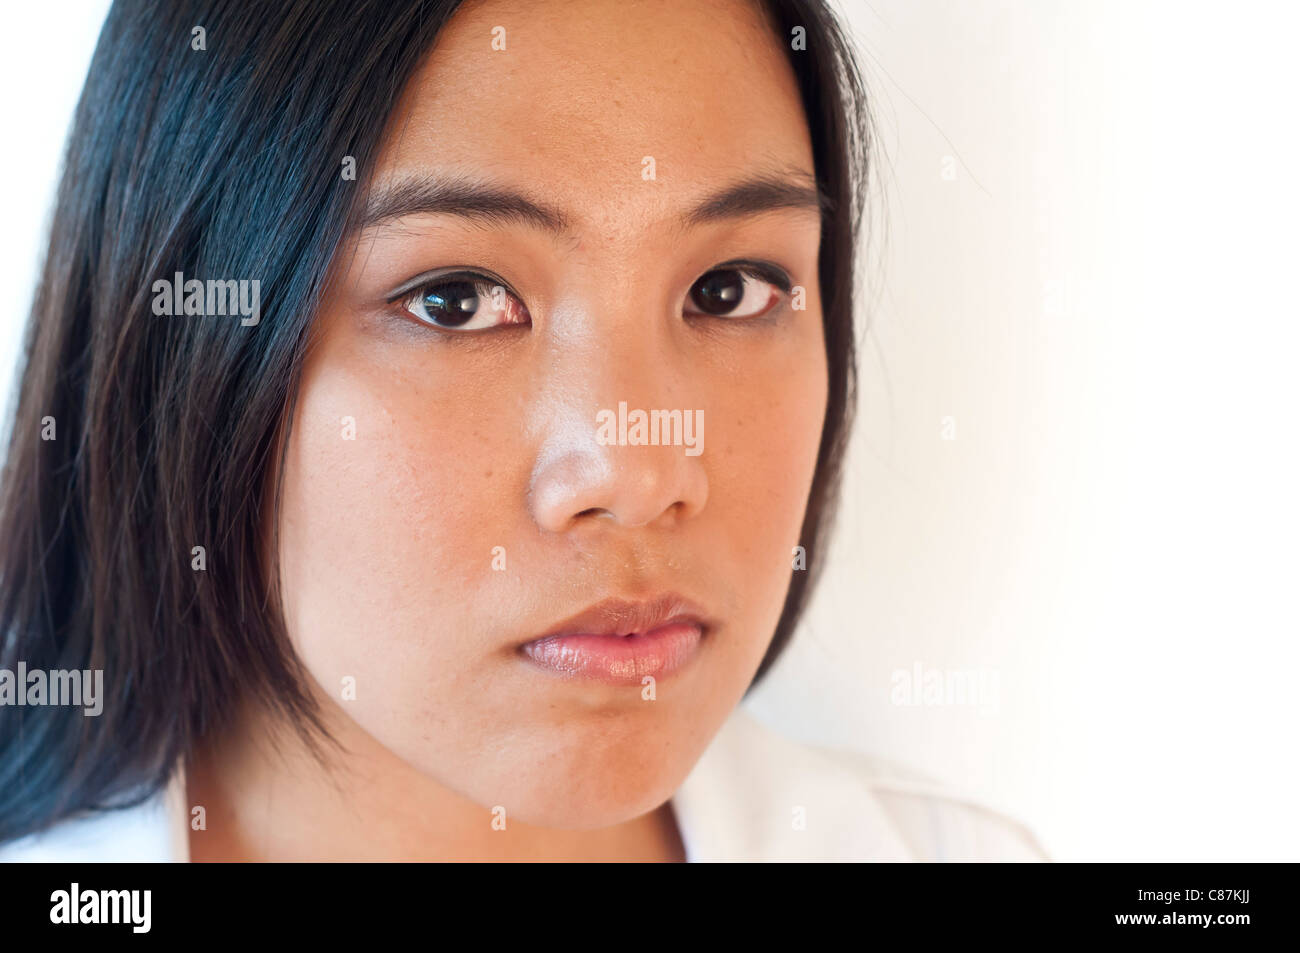 Asian woman portrait-No negative usage allowed Stock Photo